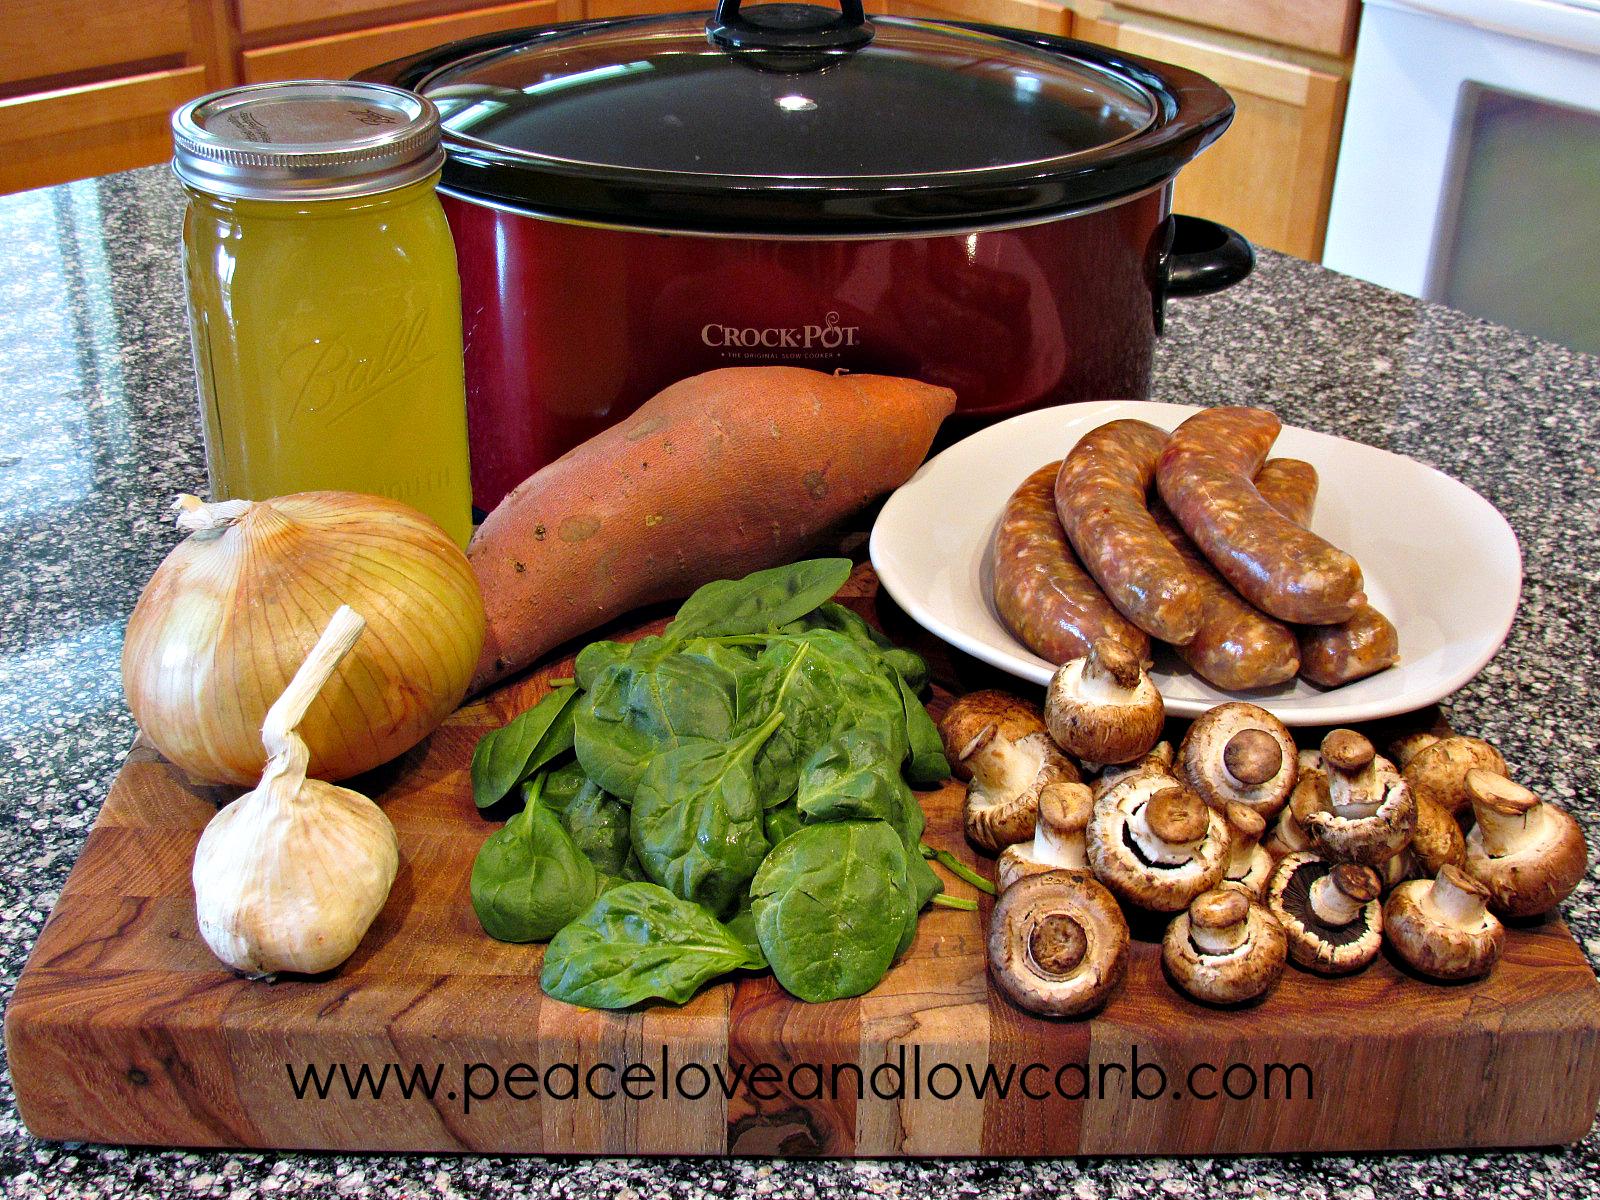 Spicy Sausage, Sweet Potato Soup – Low Carb, Gluten Free, Paleo